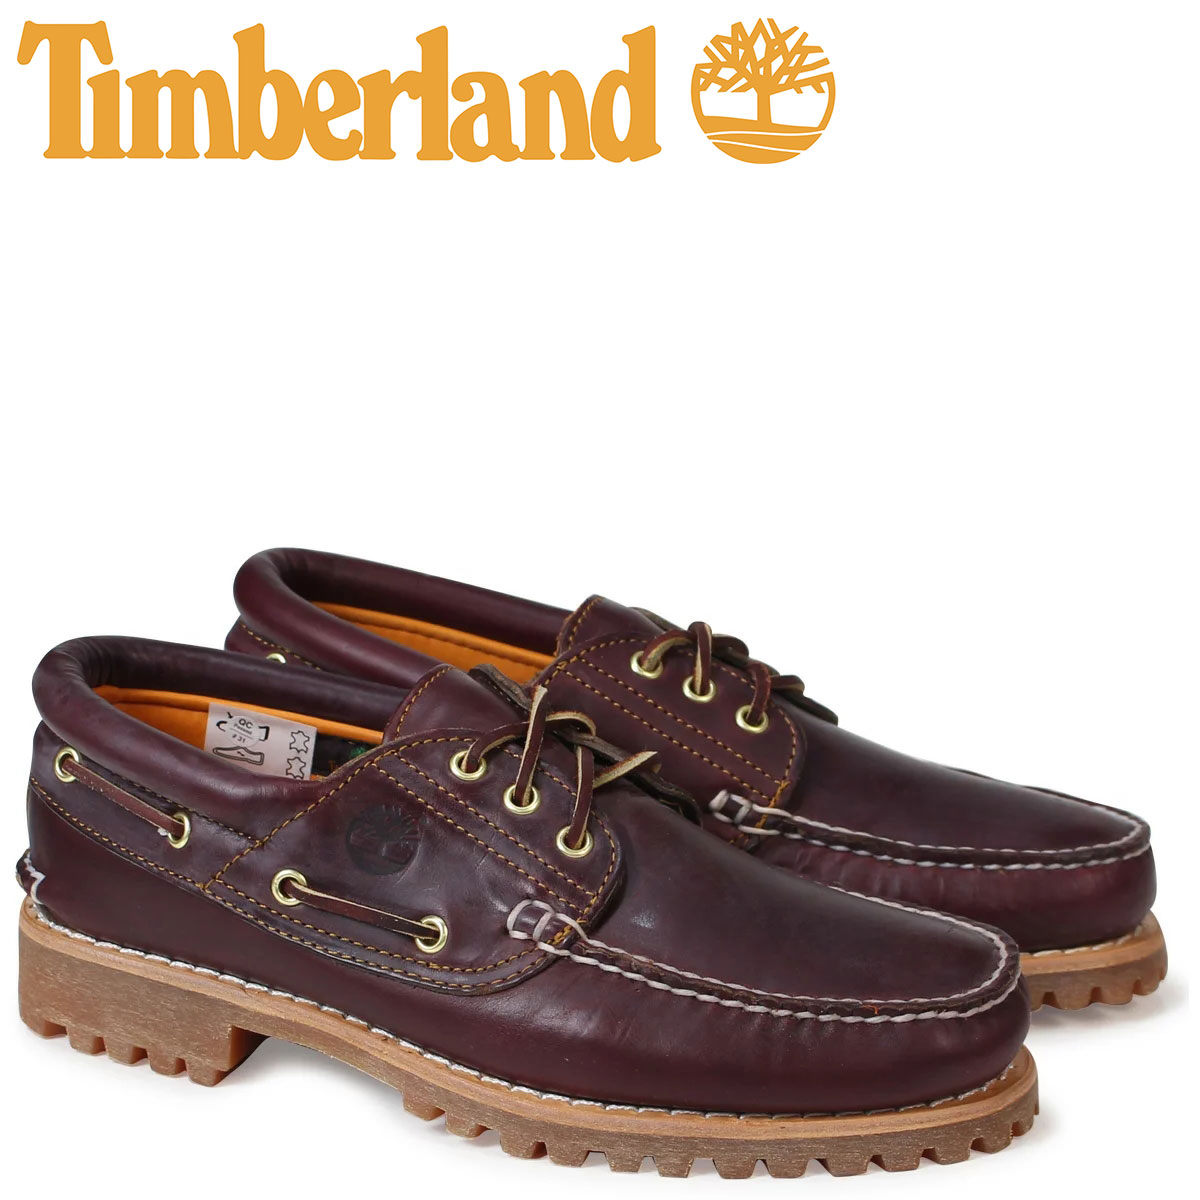 Timberland デッキシューズ メンズ ティンバーランド HERITAGE 3 EYE CLASSIC LUG 50009